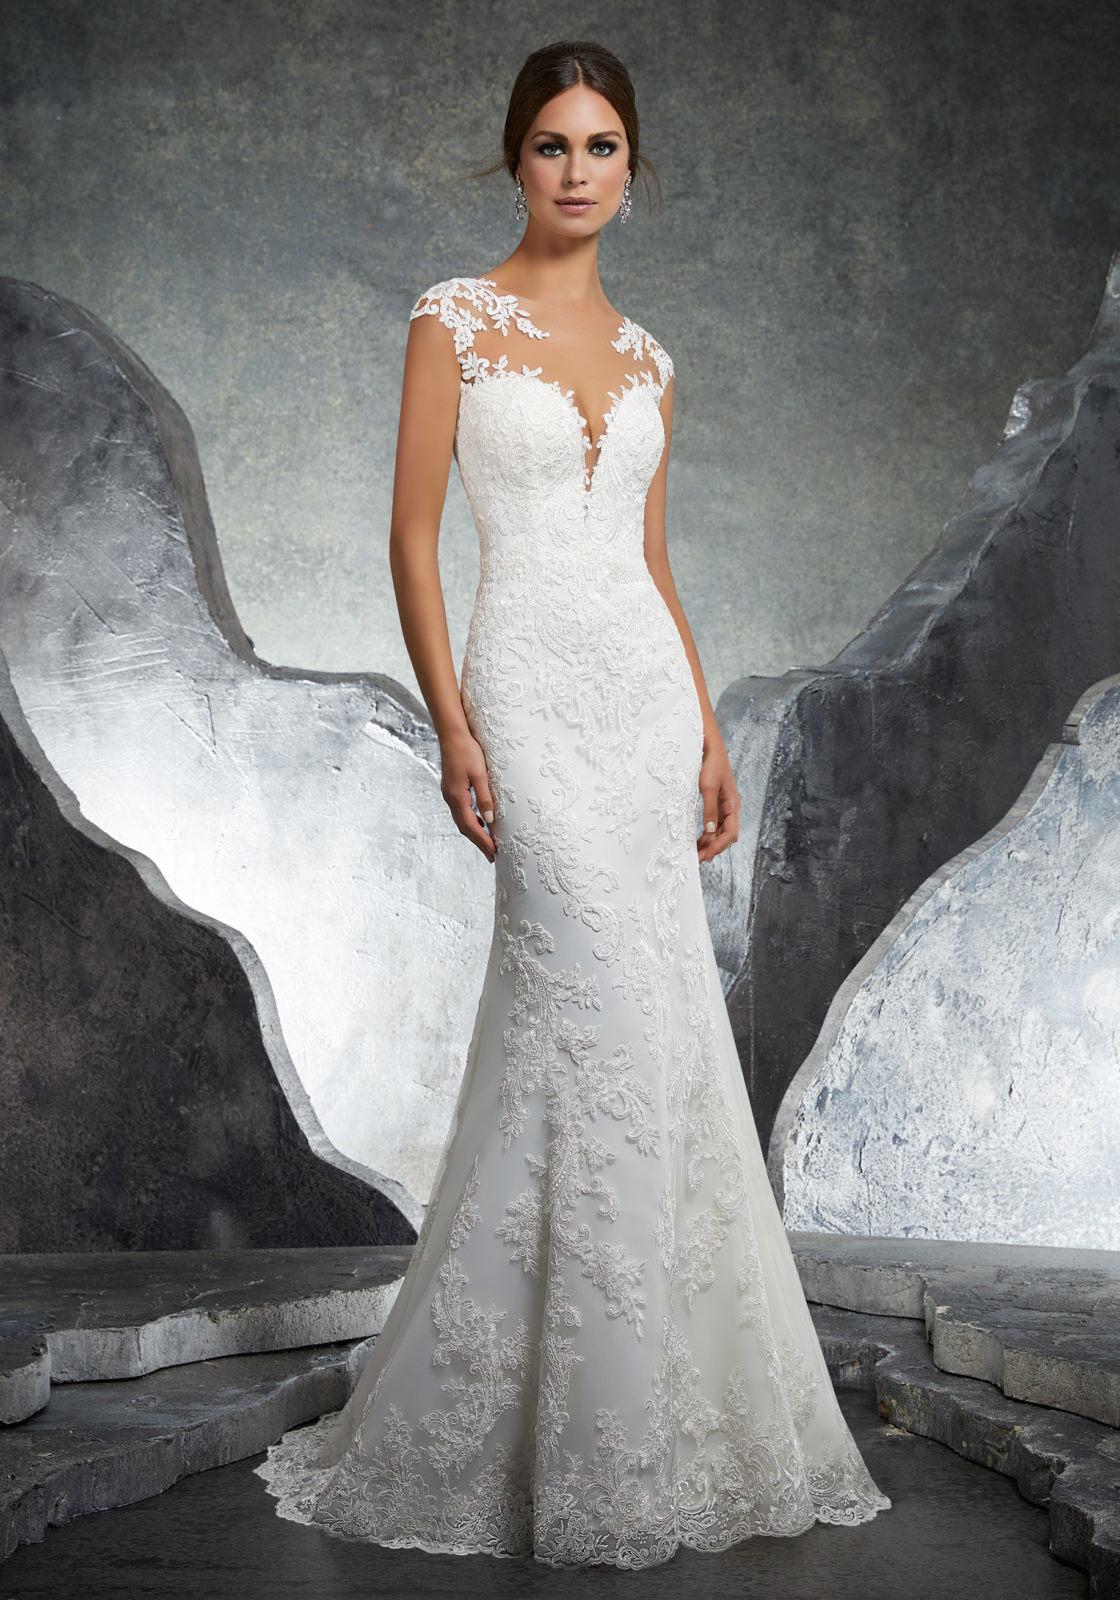 9110eeddcd China Applique Over Champagne Tulle Sleeveless Mermaid Wedding Dress  W1471944 - China Wedding Dress, Wedding Gown